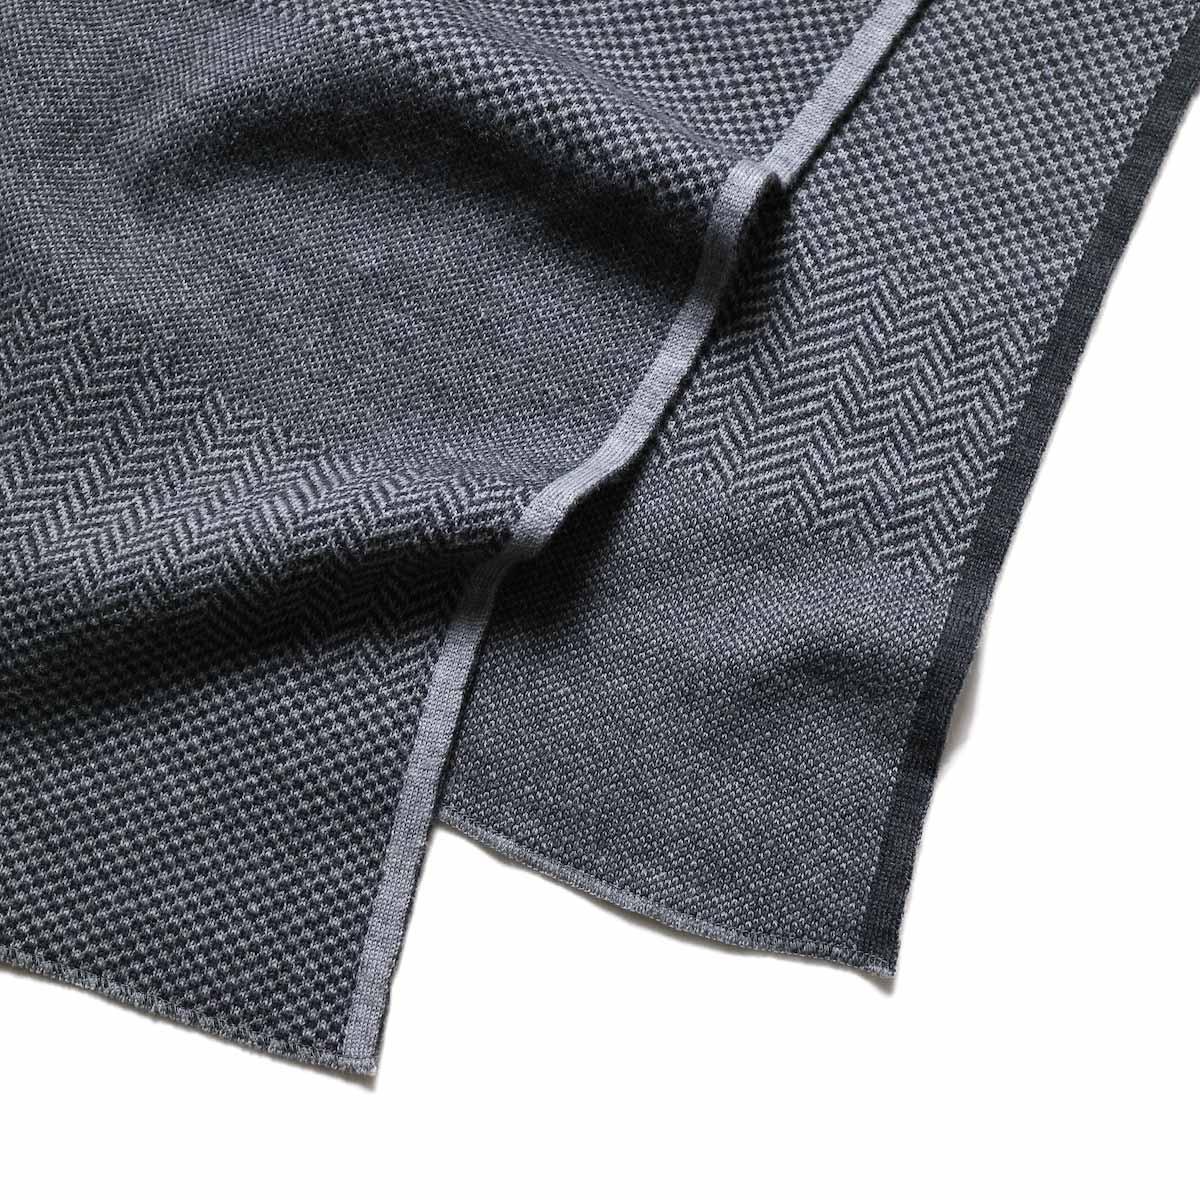 Engineered Garments / Knit Scarf - Wool HB グレー